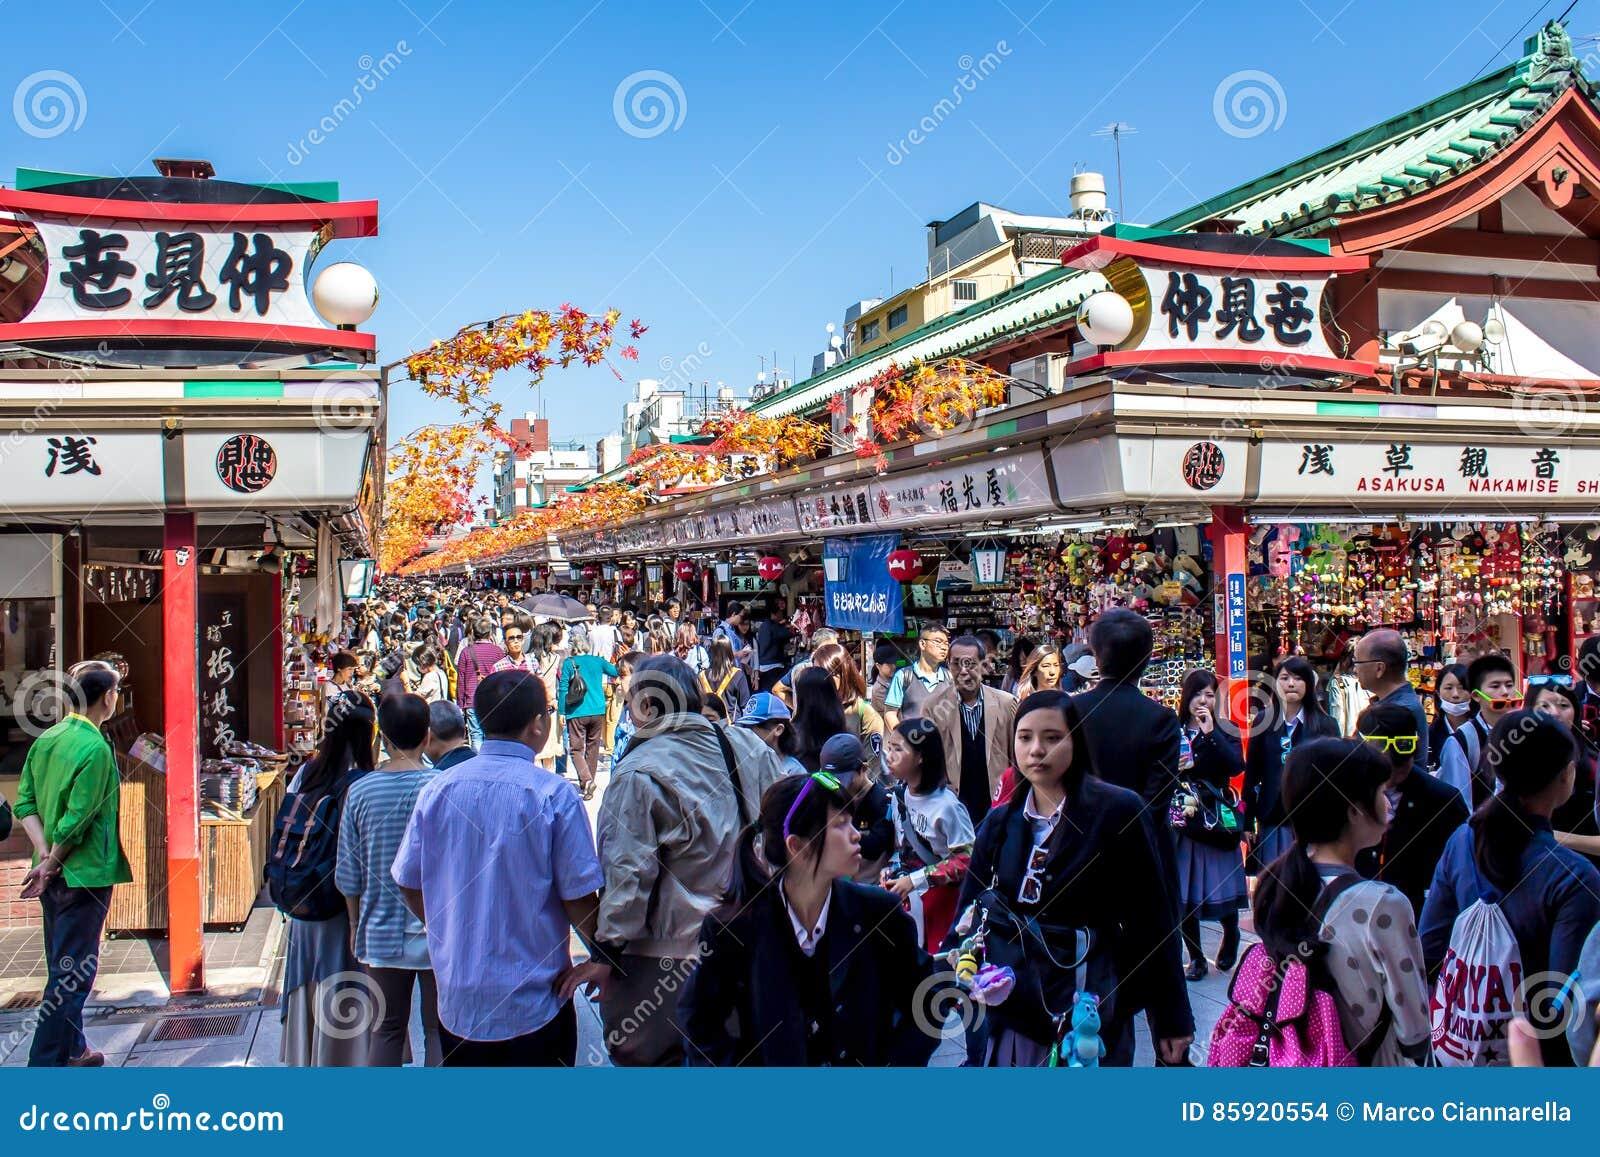 Crowds of tourists at Nakamise-dori